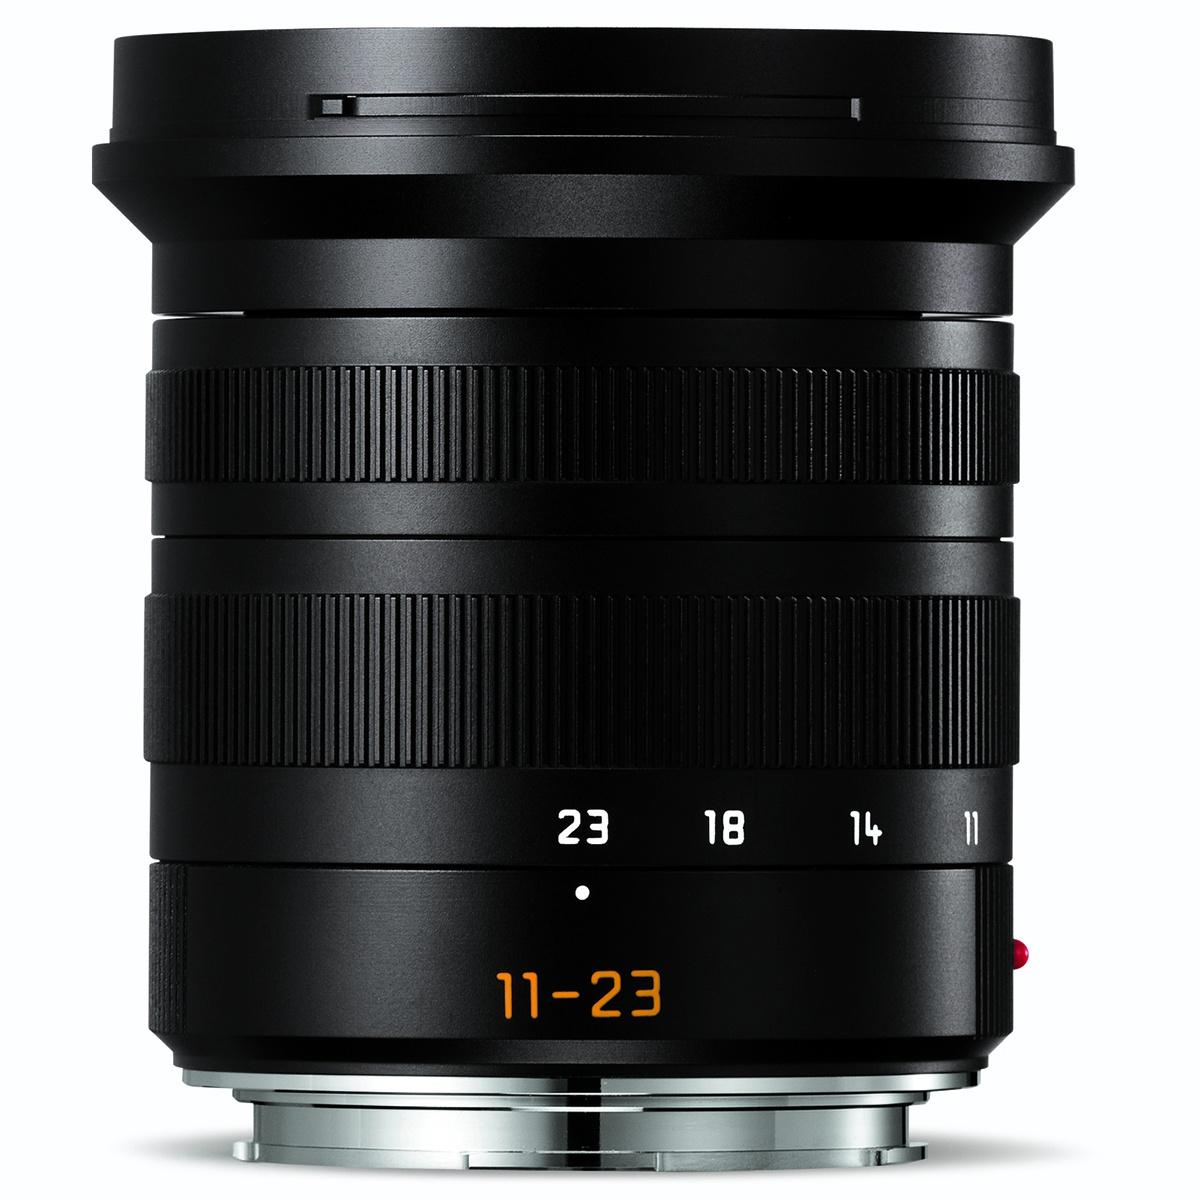 Leica 11-23 mm 1:3,5-4,5 Super-Vario-Elmar-TL ASPH